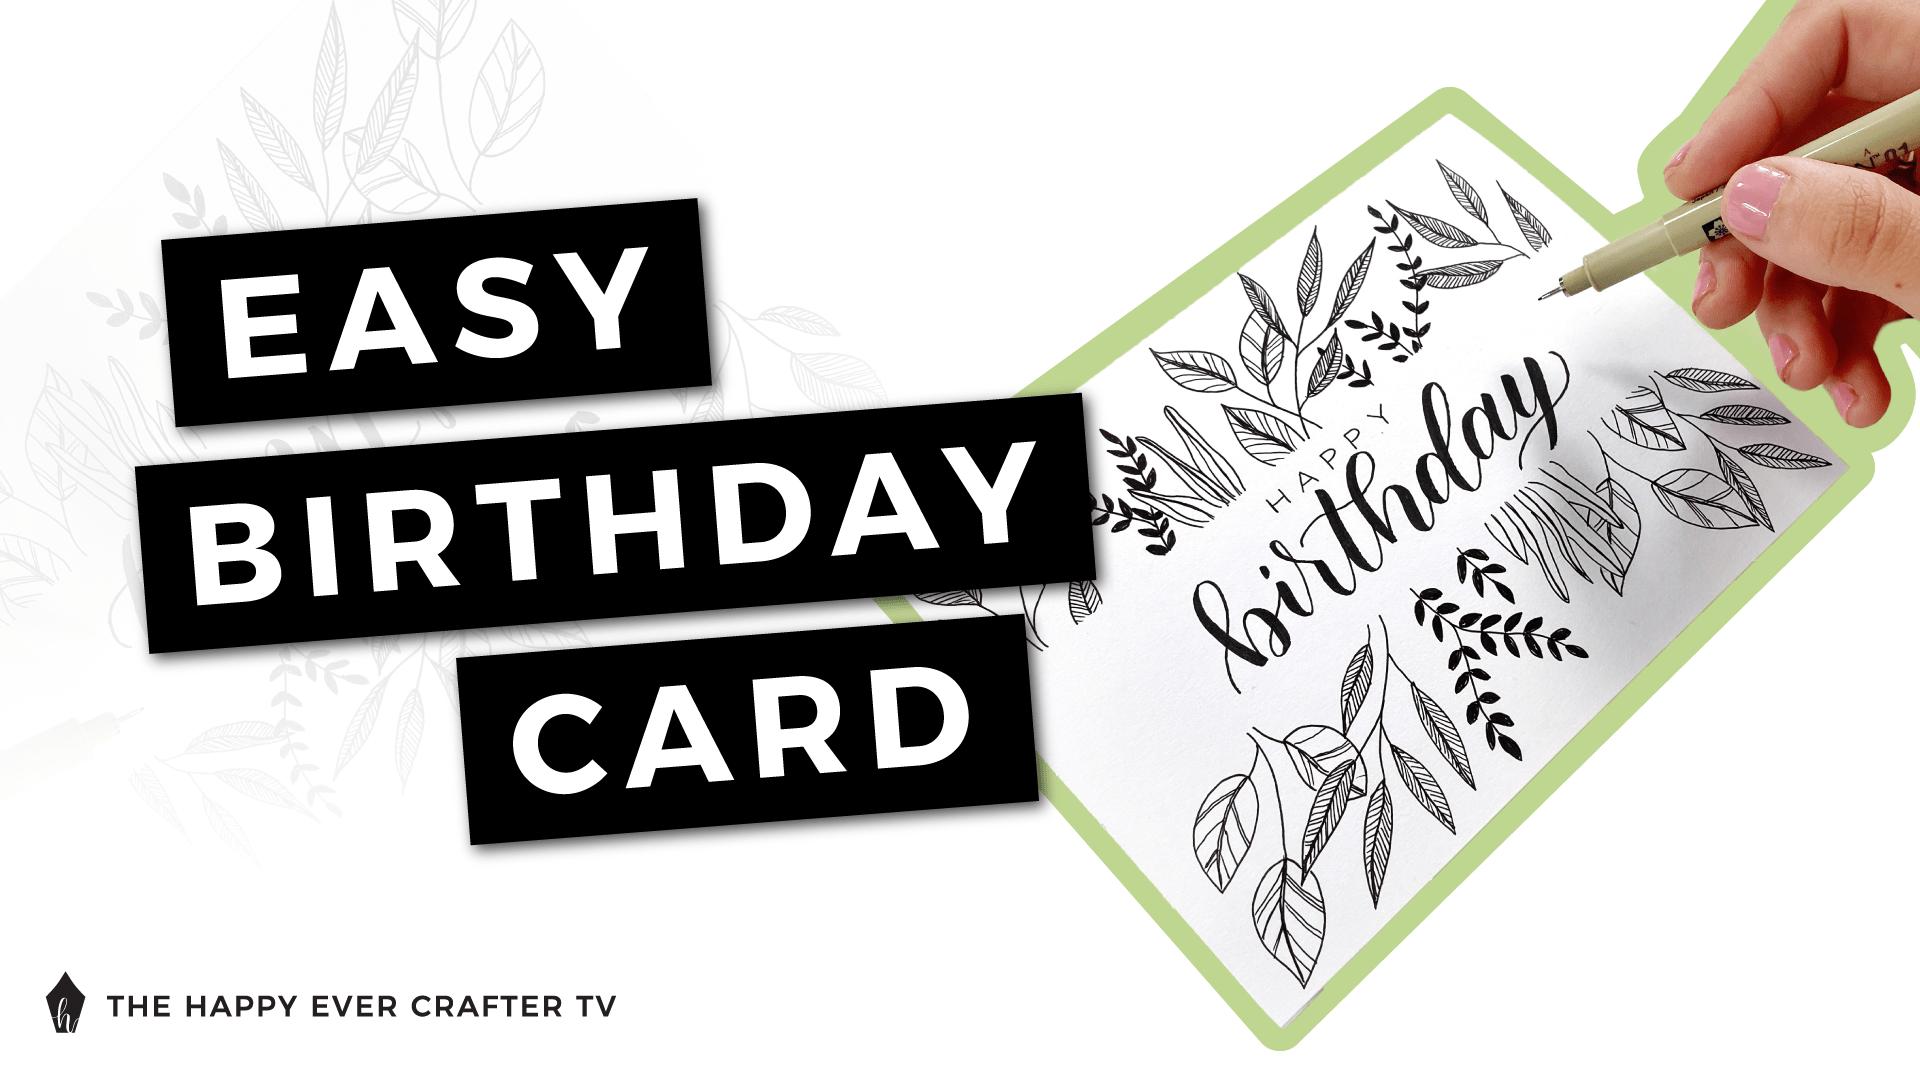 Easy Birthday Card Photo